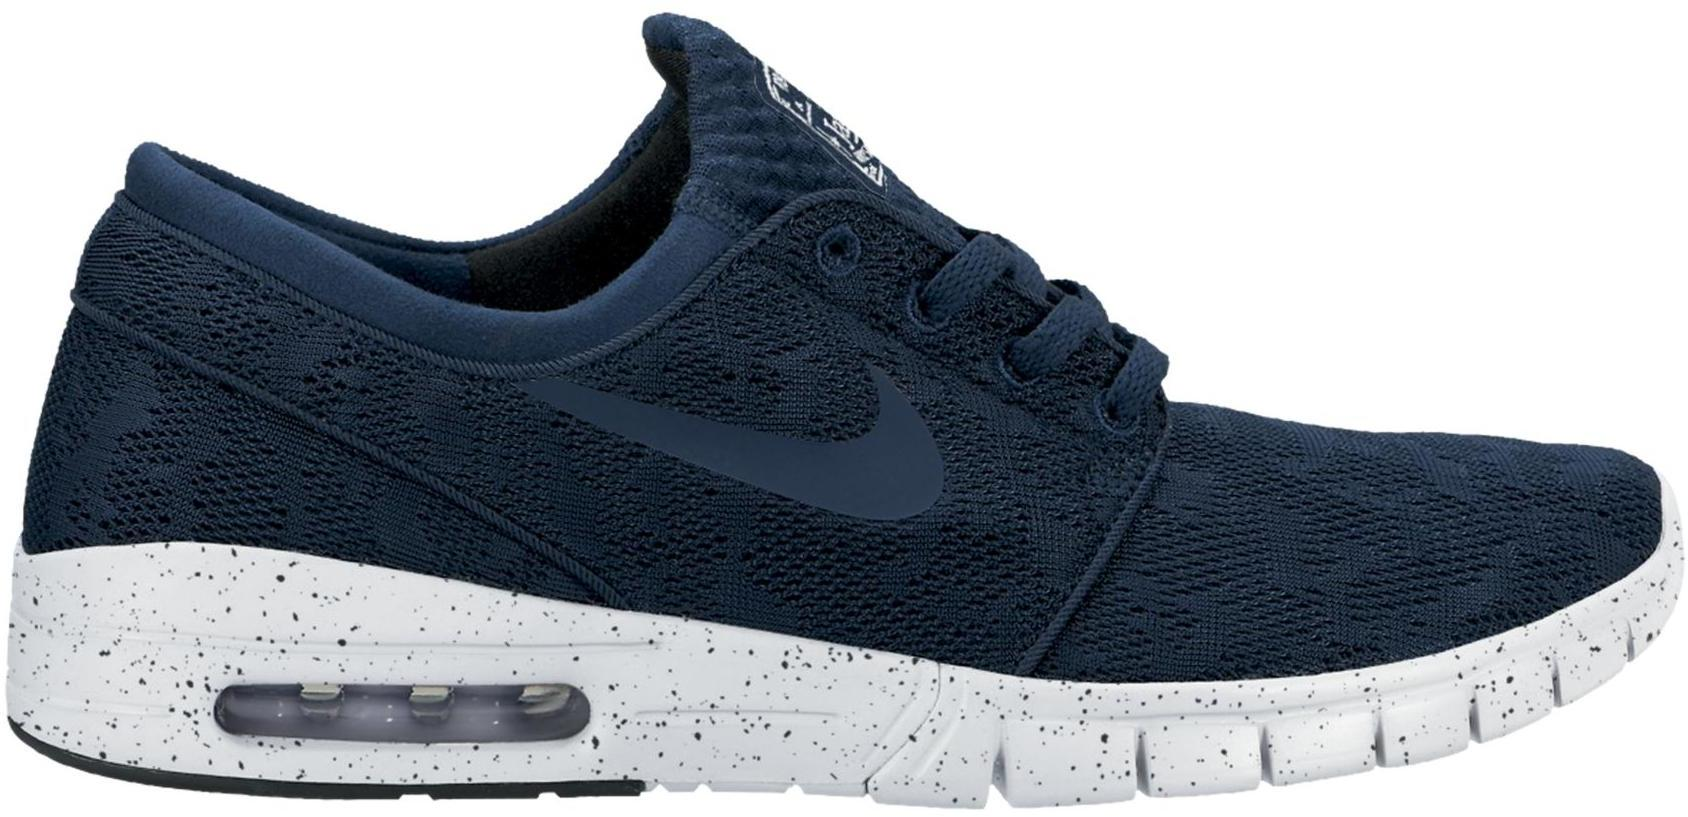 Nike SB Stefan Janoski Max Midnight Navy - 631303-441